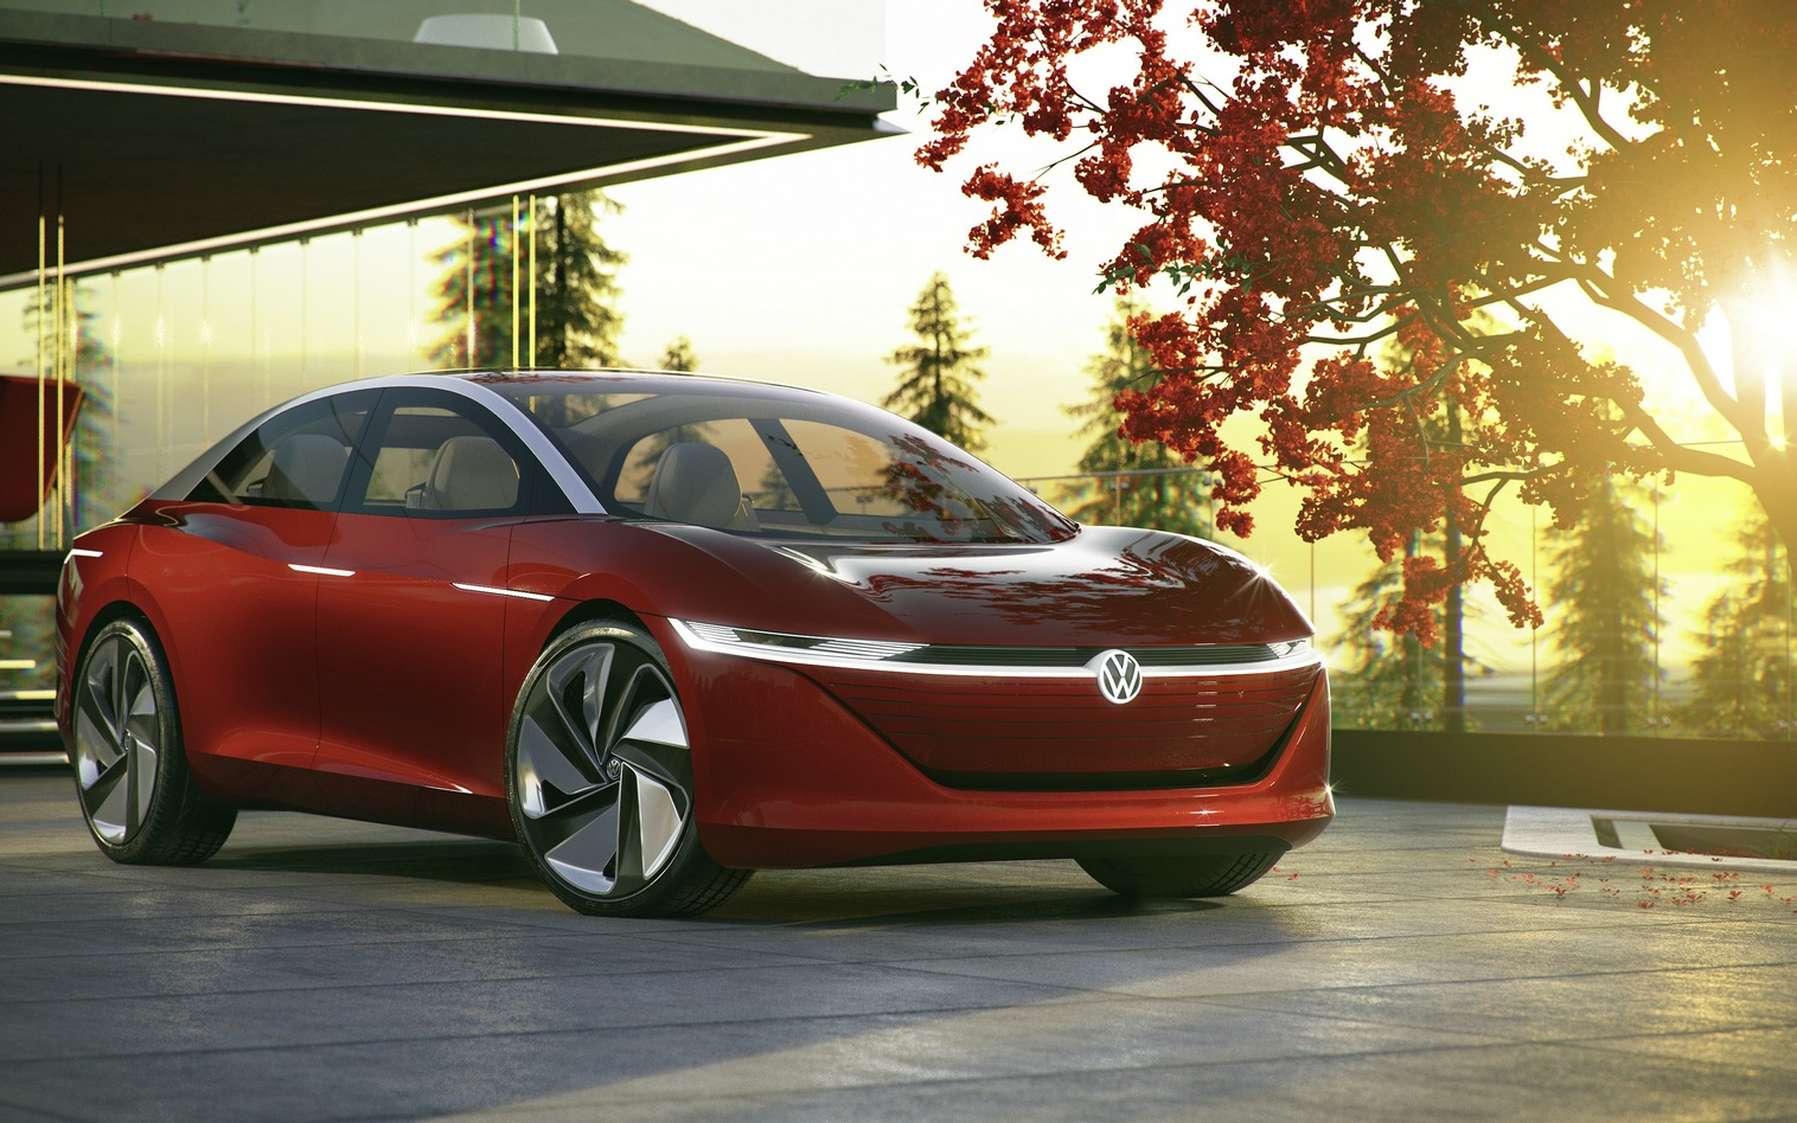 Le concept-car ID Vizzion de Volkswagen. © Volkswagen